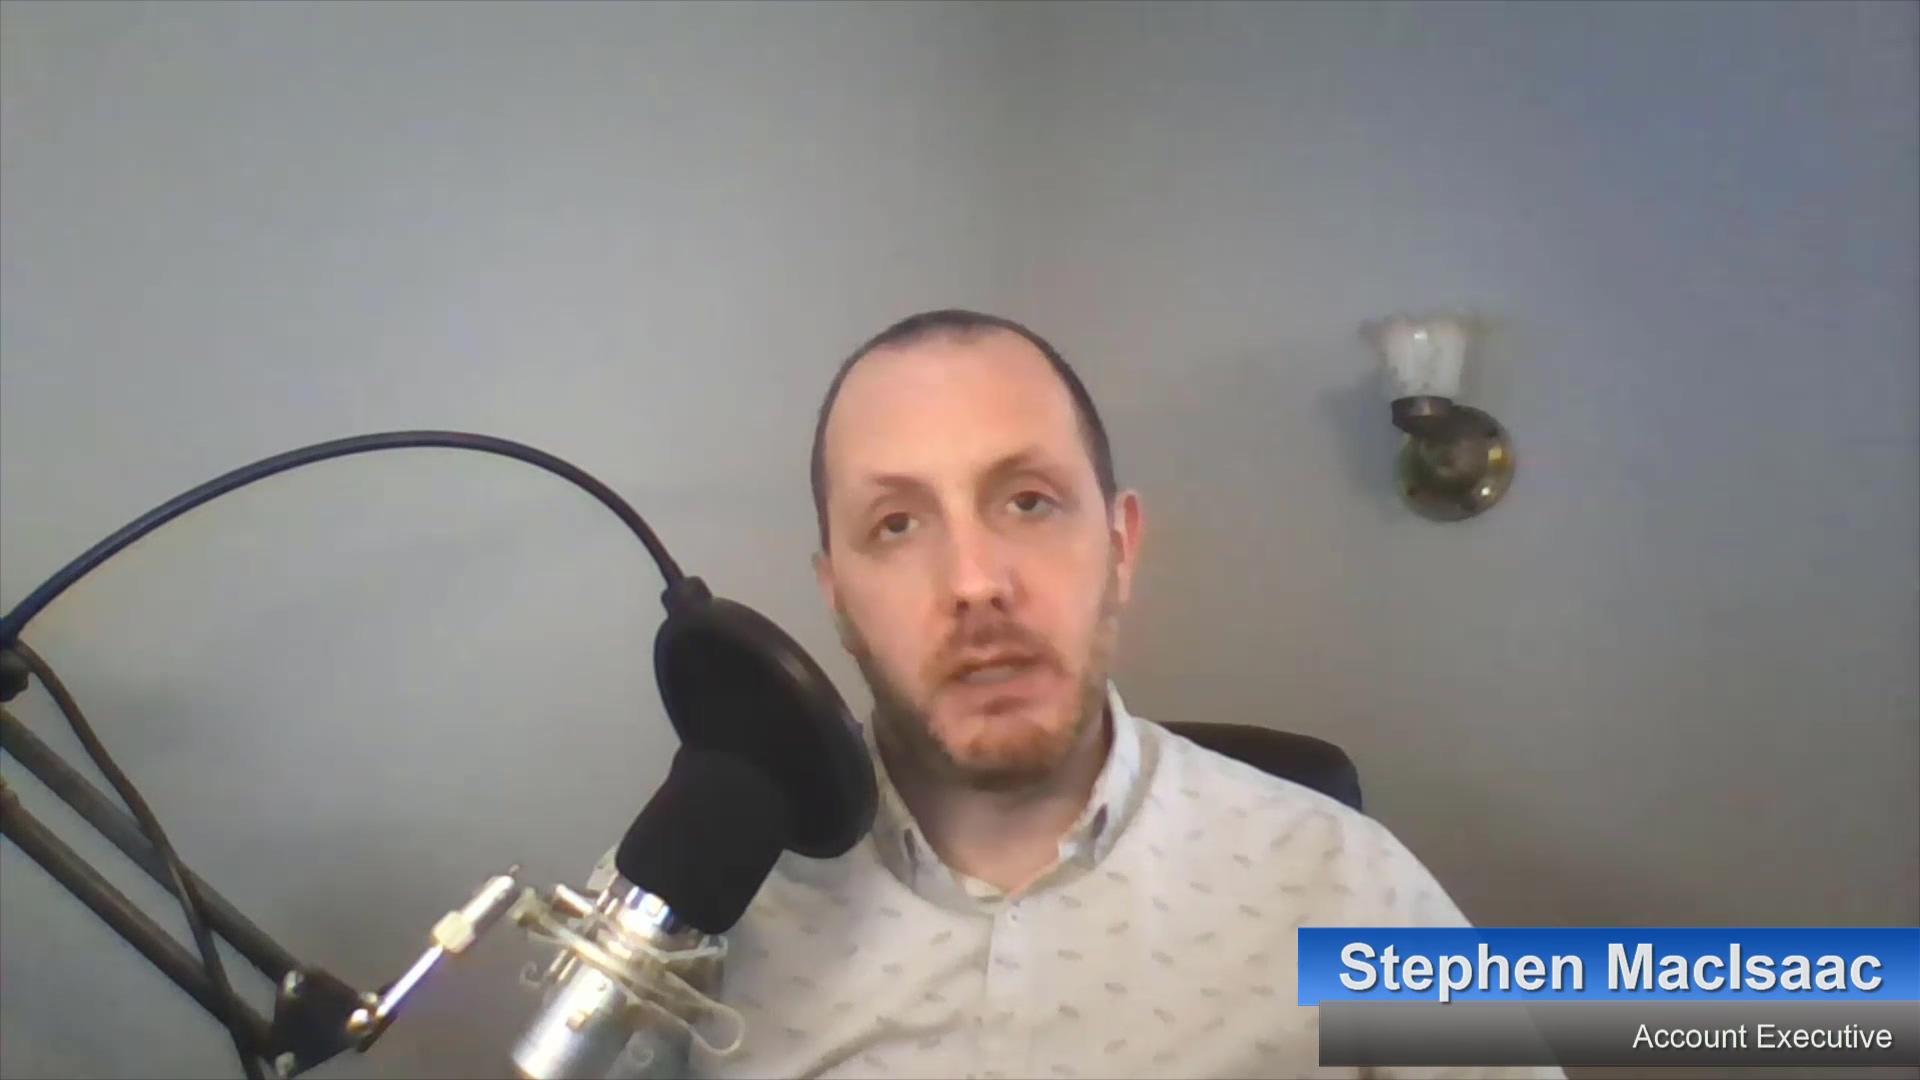 Stephen COVID 19 video